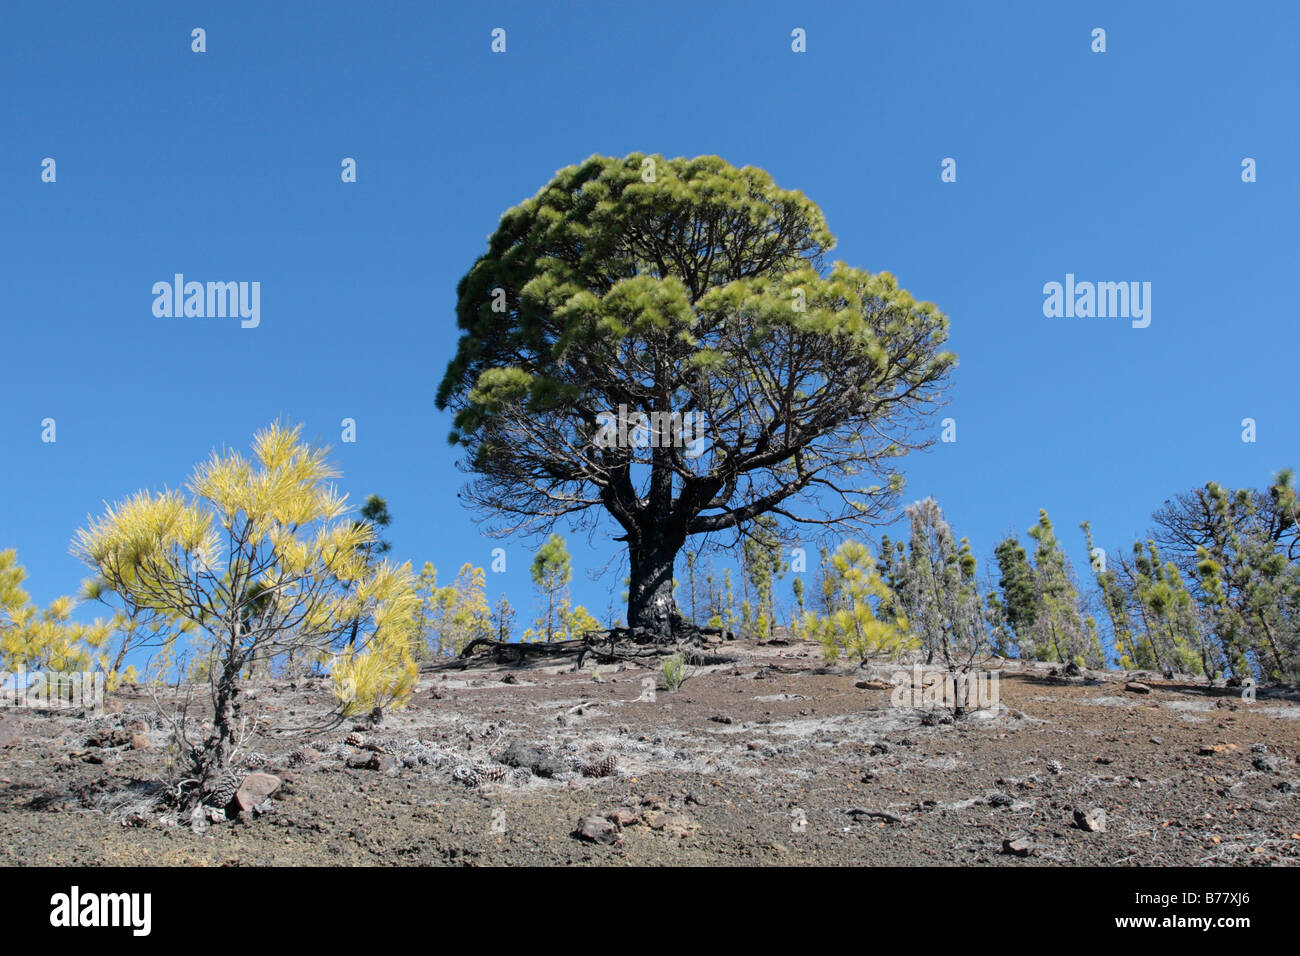 Large pinus pics